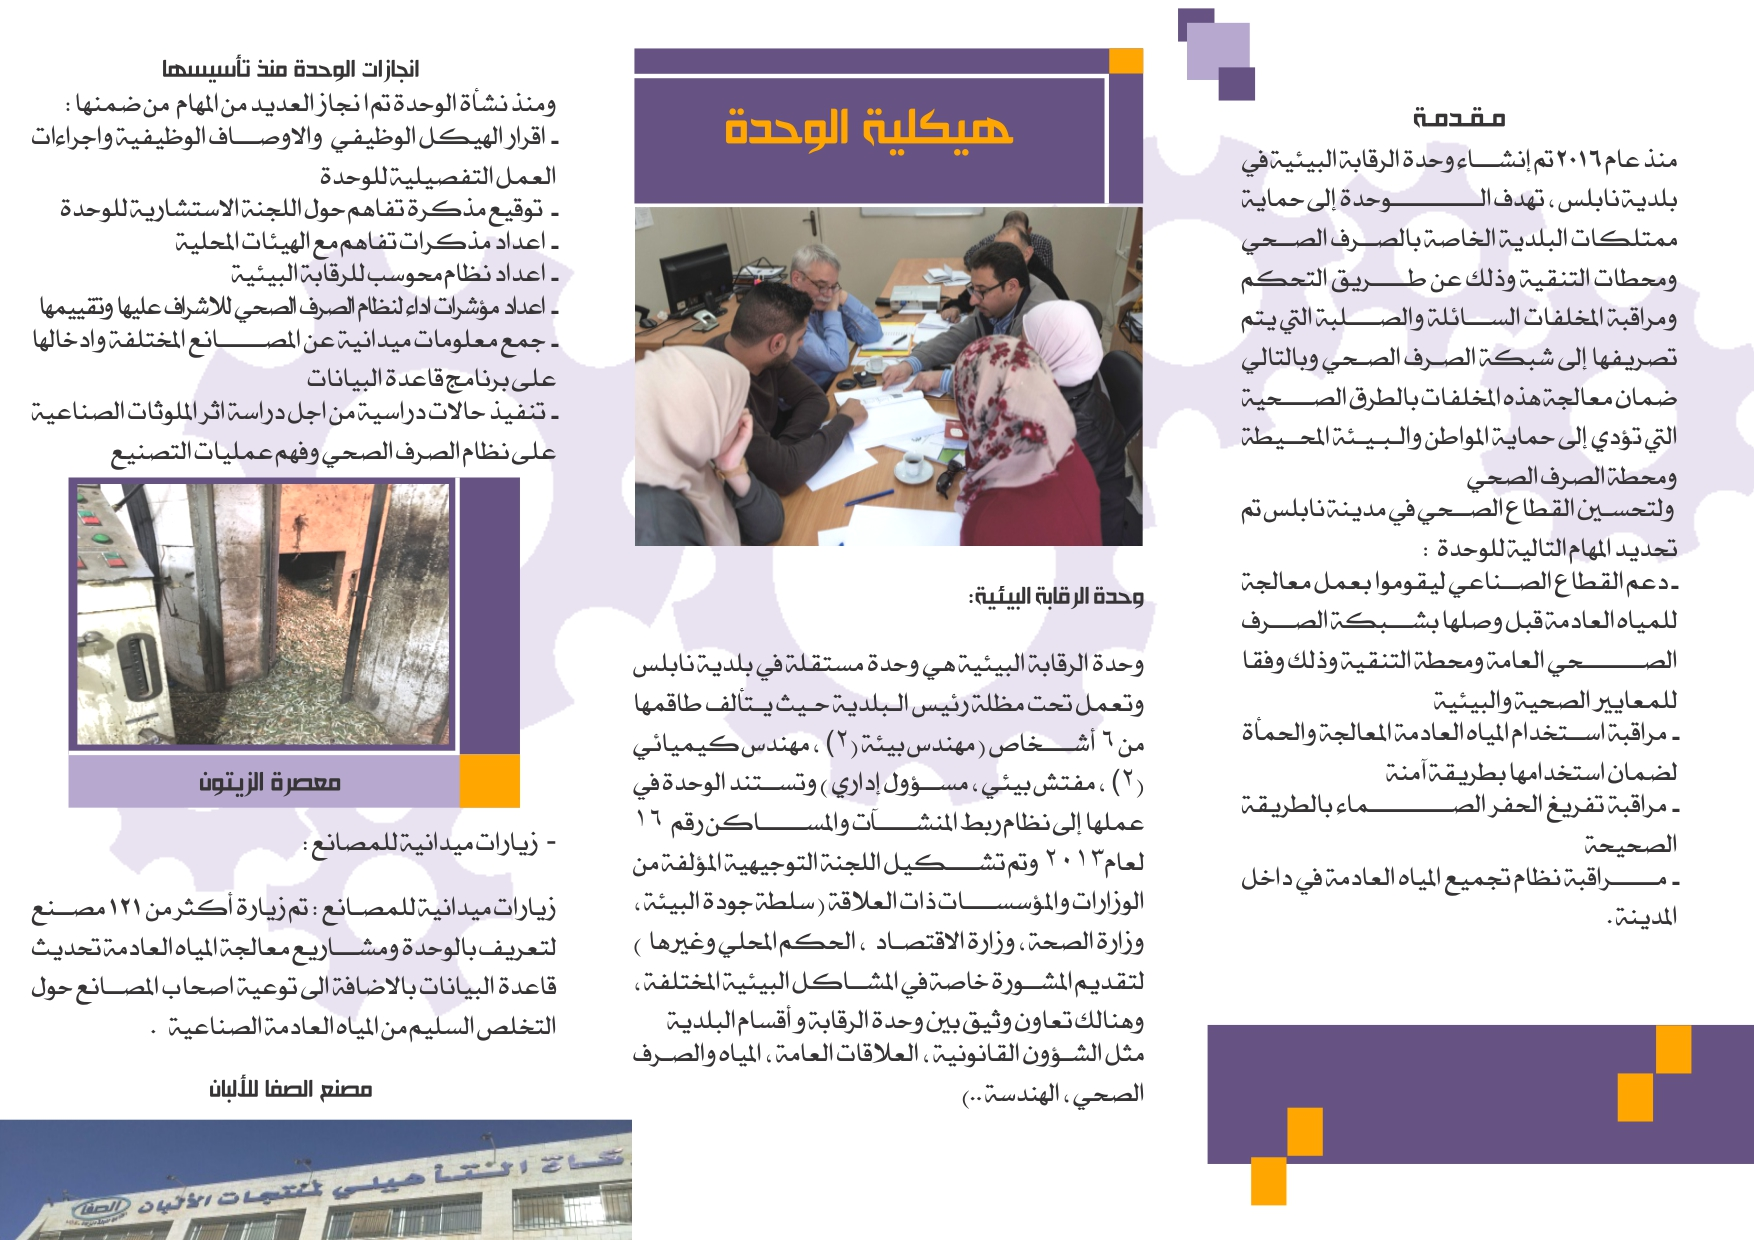 management of solid waste in nablus Artigo - industrial solid waste management in the governorates of nablus and ramallah e al-bireh palestine - 2015 by chapolin8colorado.